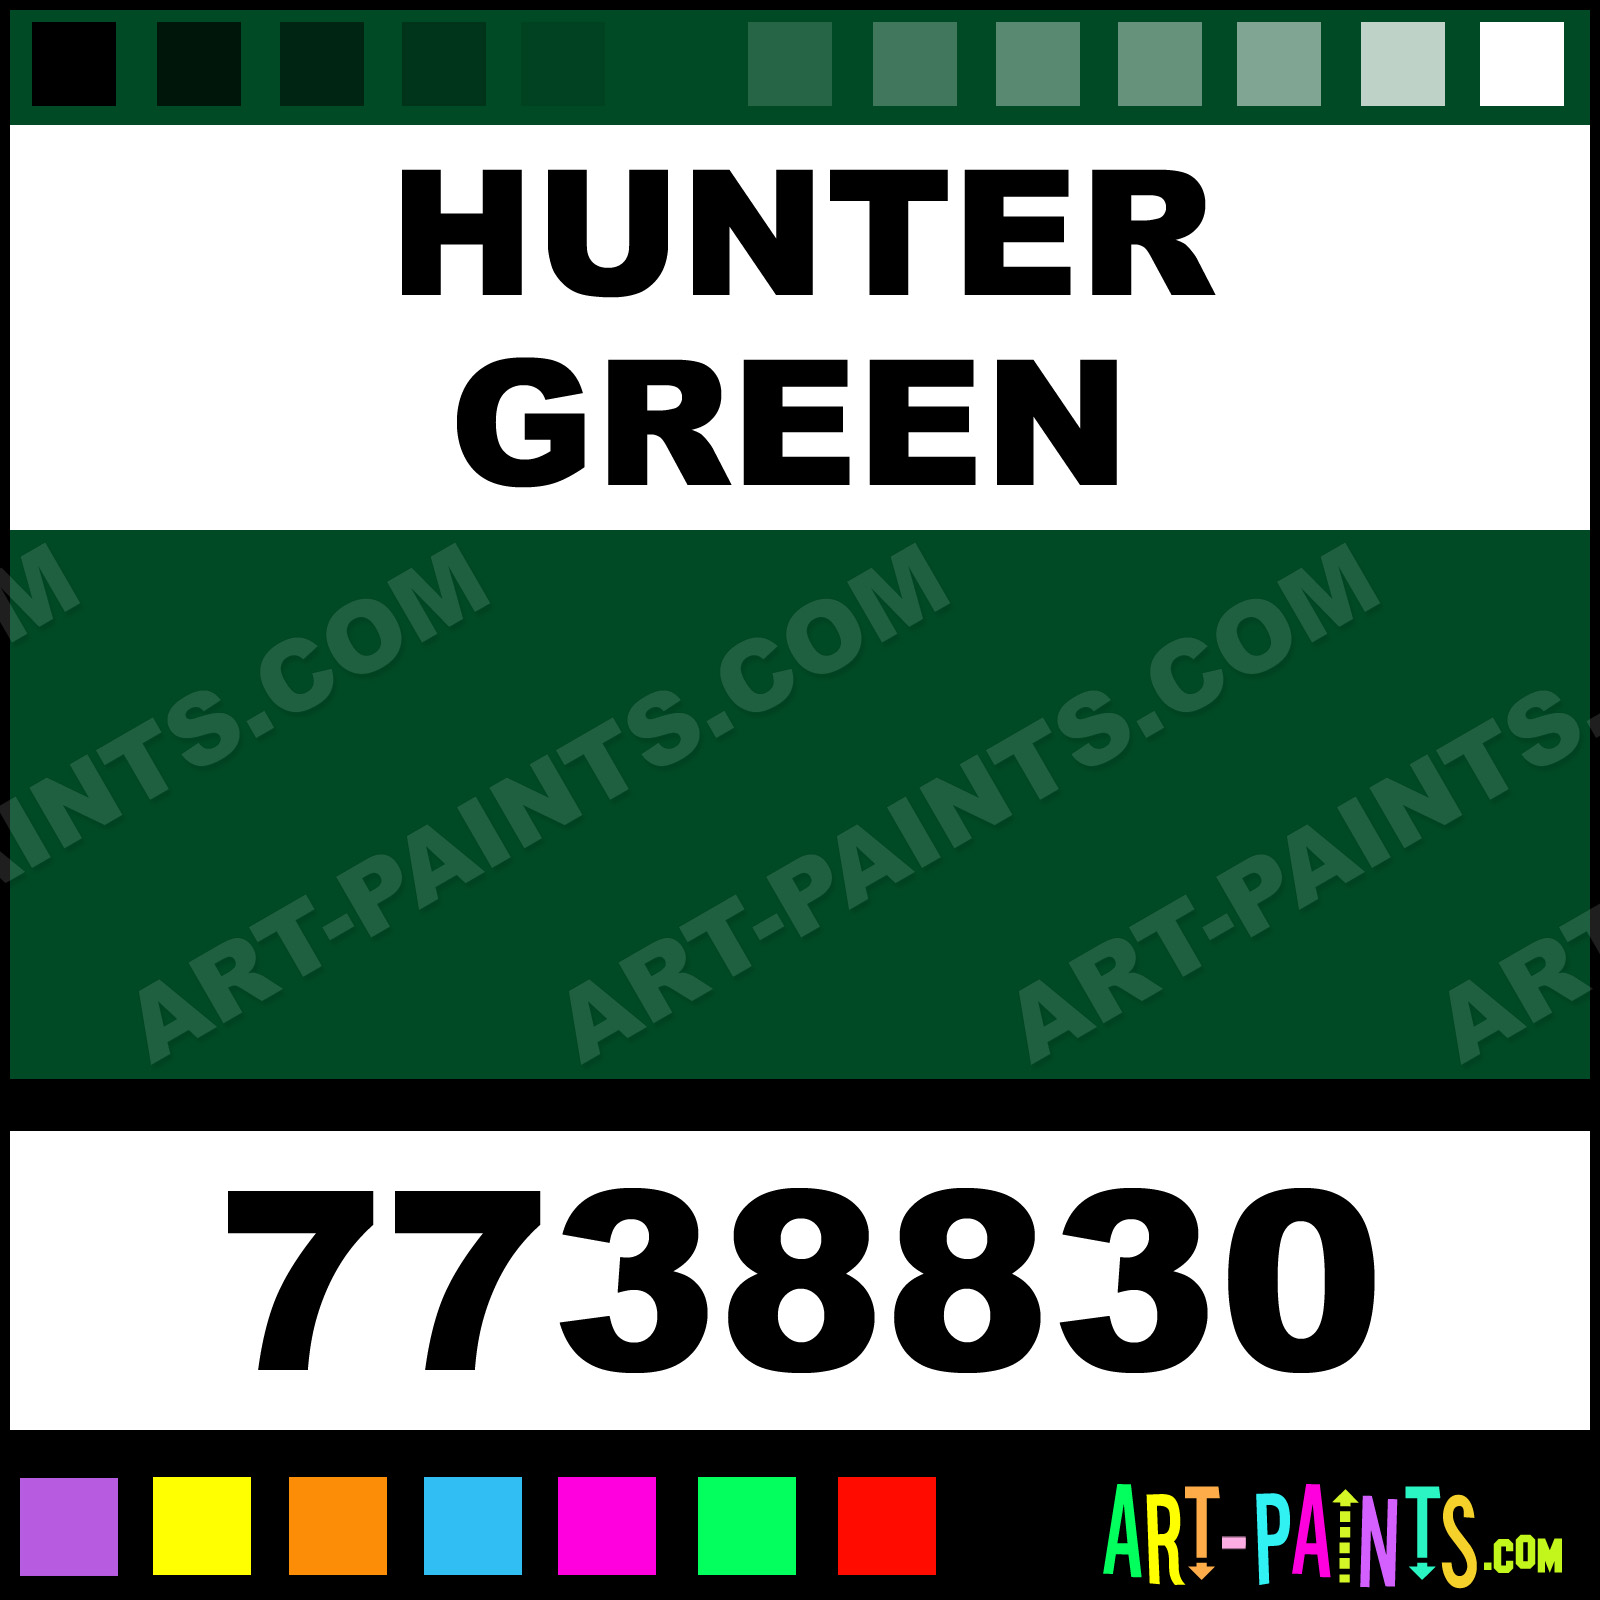 Rust Oleum Gloss Protective Paints Hunter Green